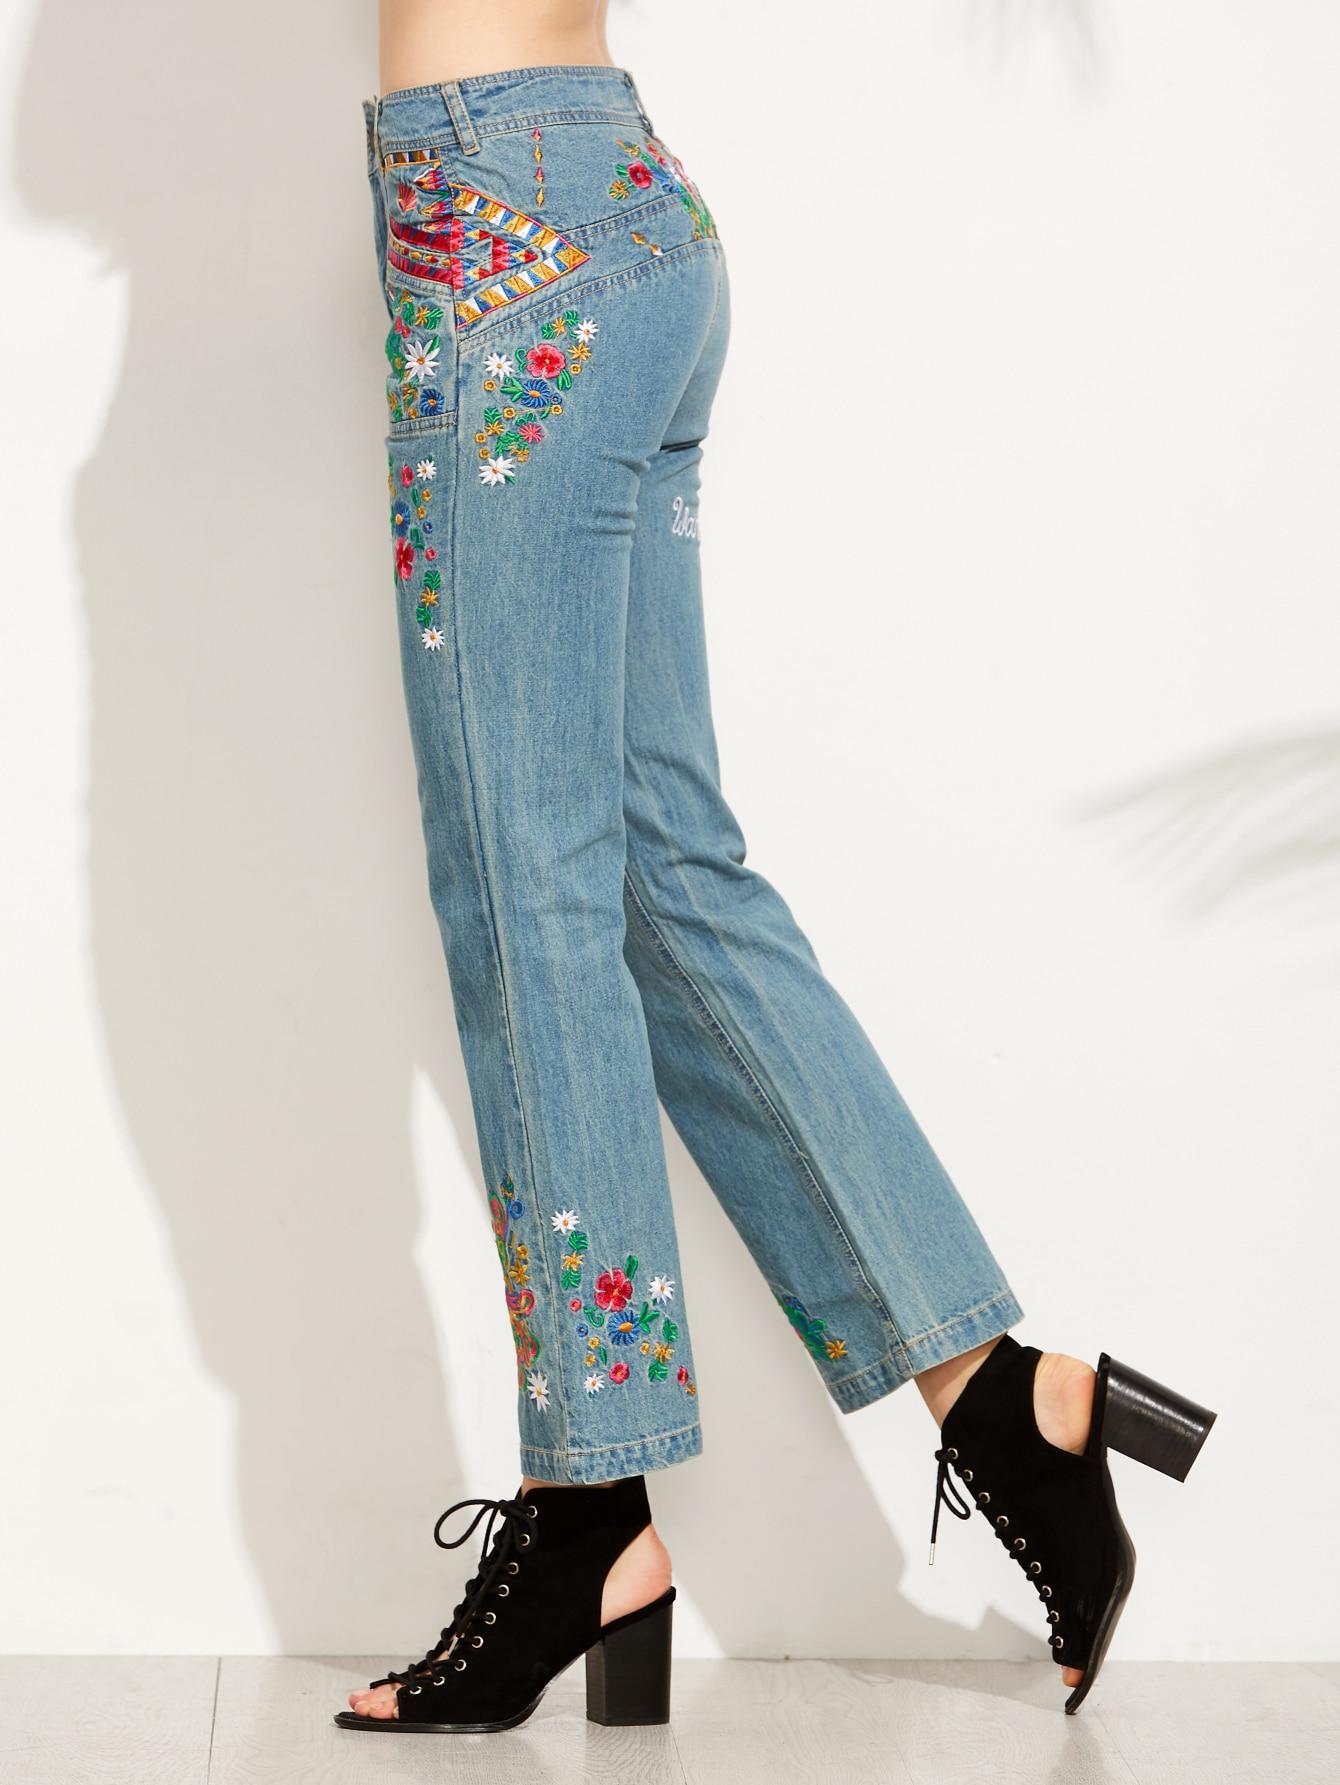 pantalons jeans avec broderie motif fleurs bleu french shein sheinside. Black Bedroom Furniture Sets. Home Design Ideas